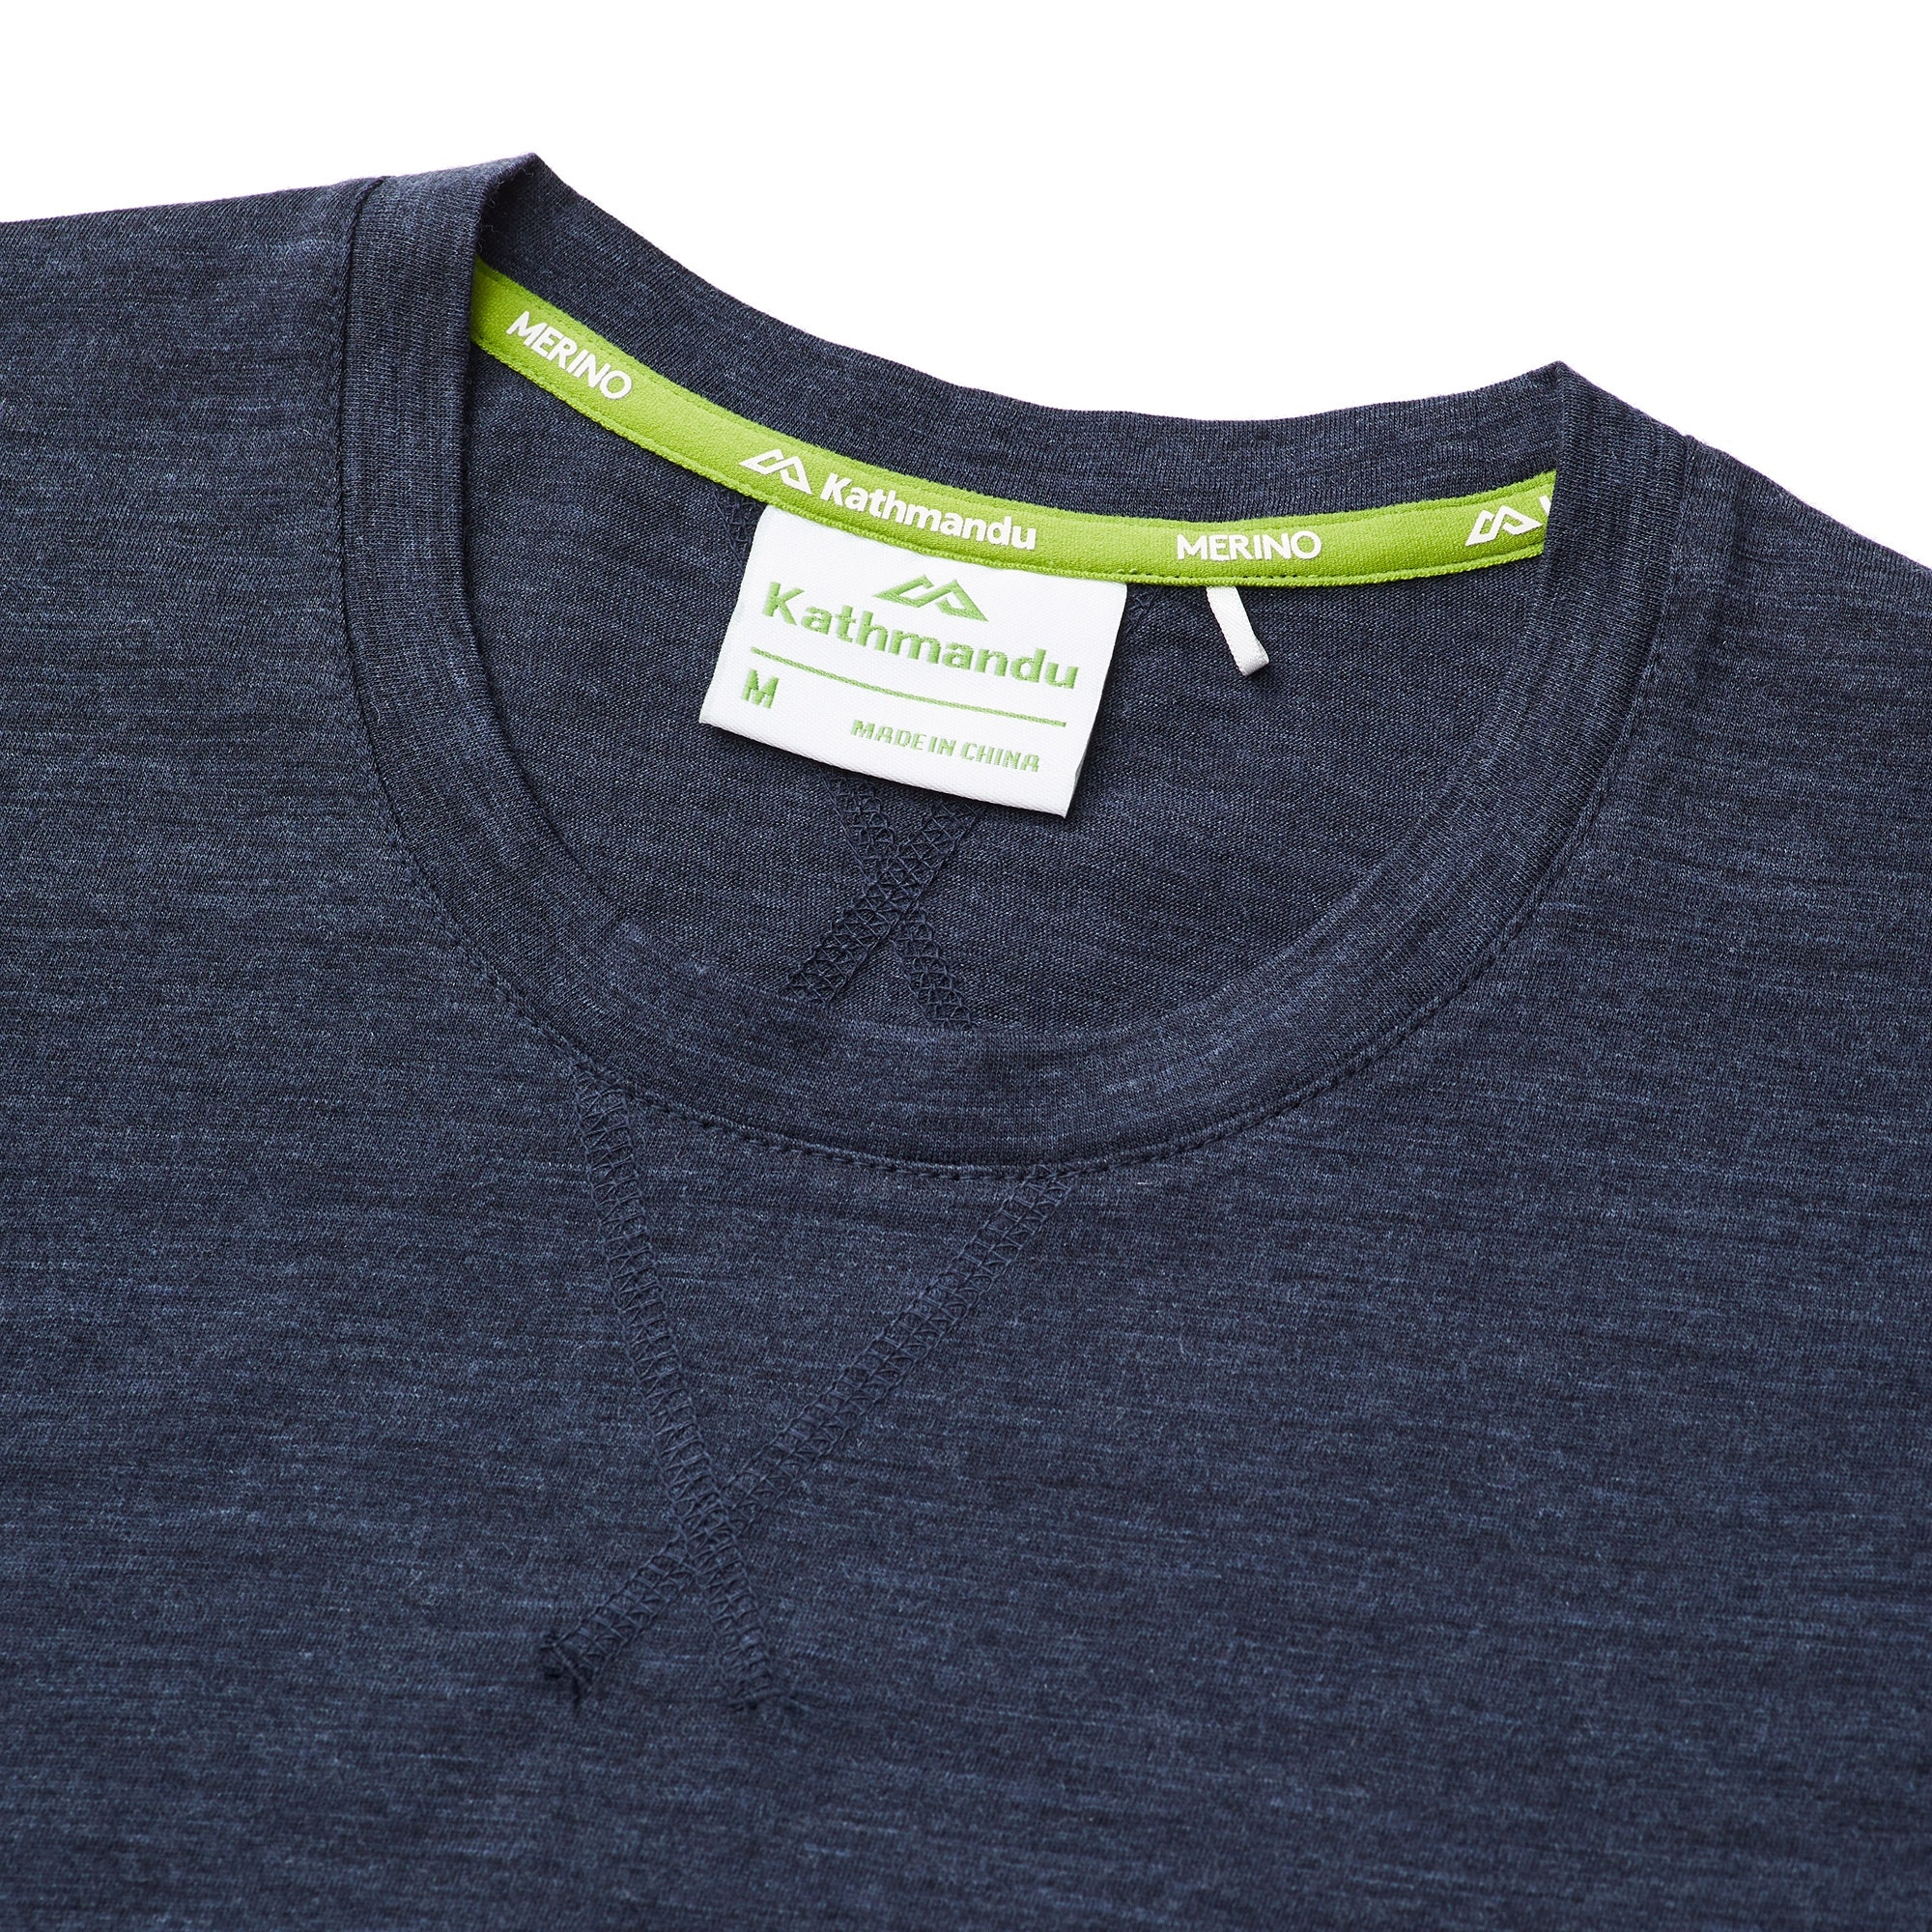 thumbnail 13 - NEW Kathmandu Core Spun Merino Wool Blend Short Sleeve Durable Men's Crew Top